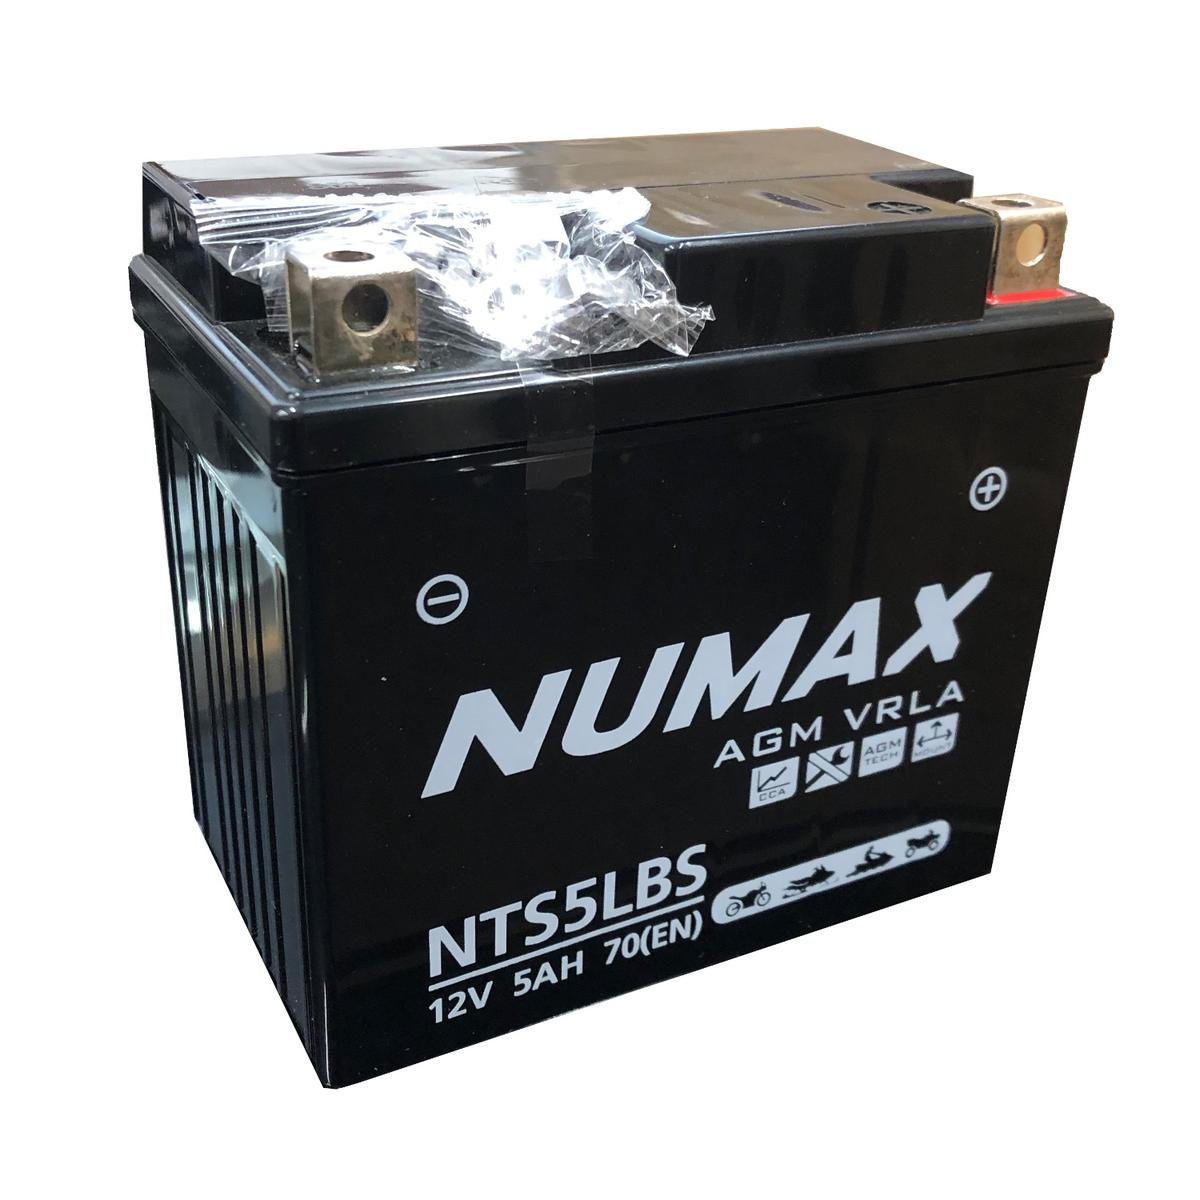 Numax 12v NTS5LBS Motorbike Bike Battery PEUGEOT 100cc Looxor YTX5L-4